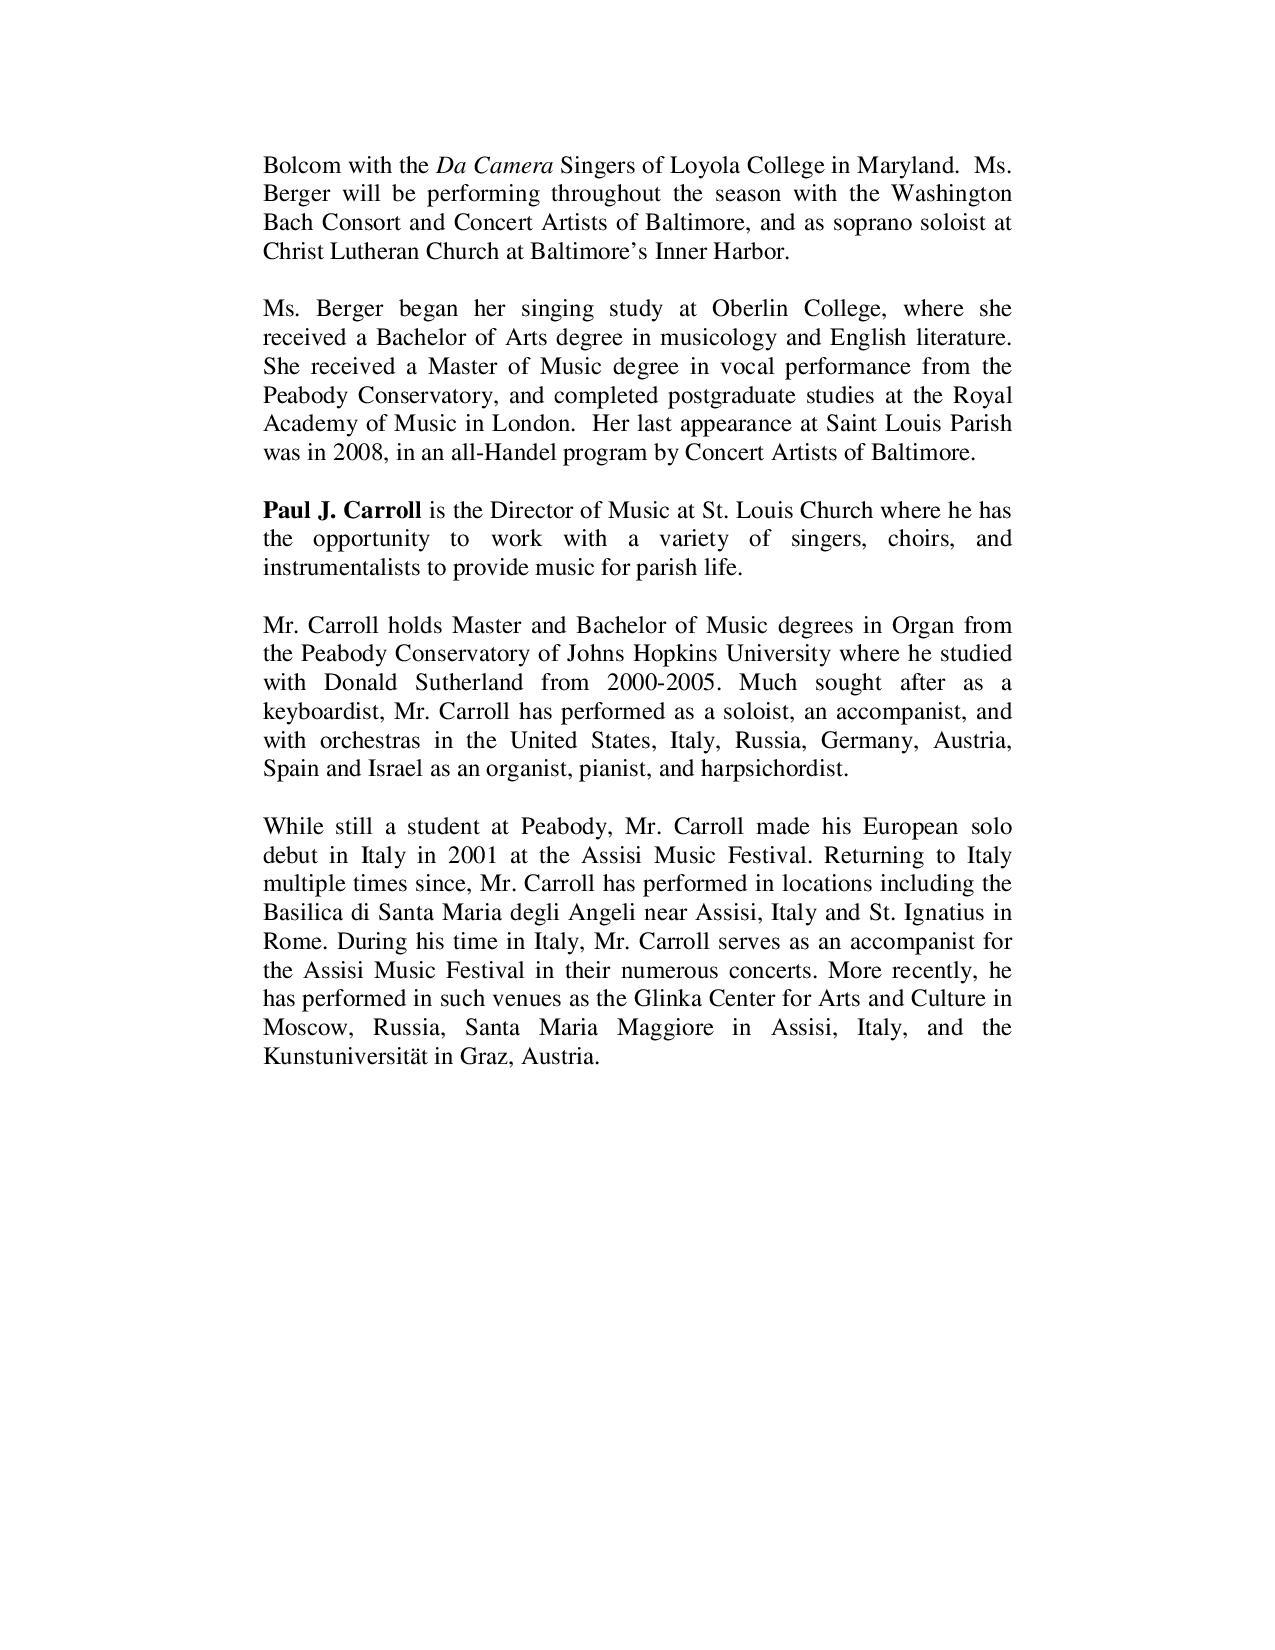 2009-04-26 - Program for Printing-page-006.jpg